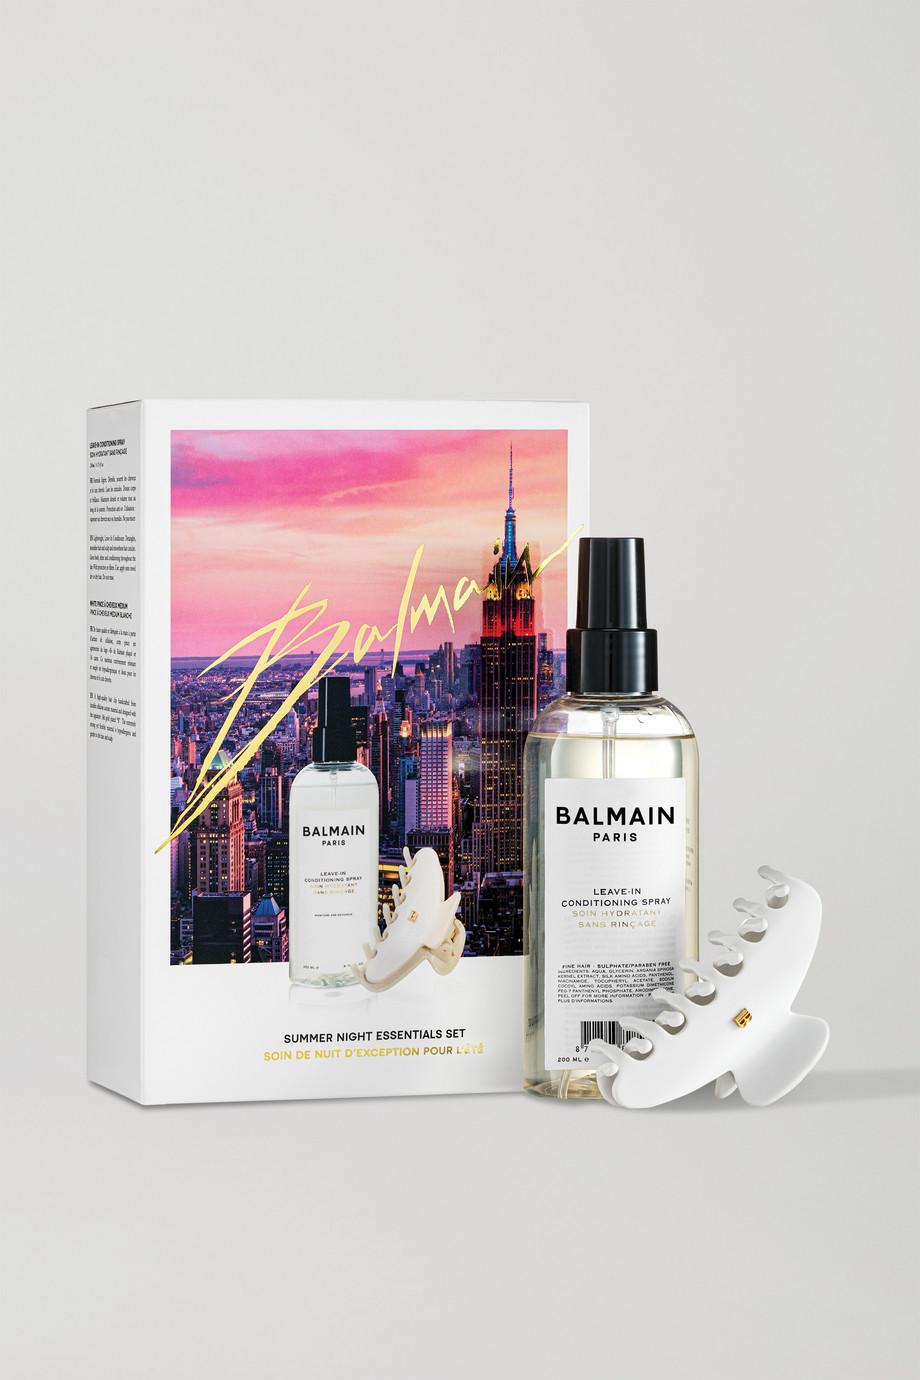 Balmain Paris Hair Couture Summer Night Essentials Set